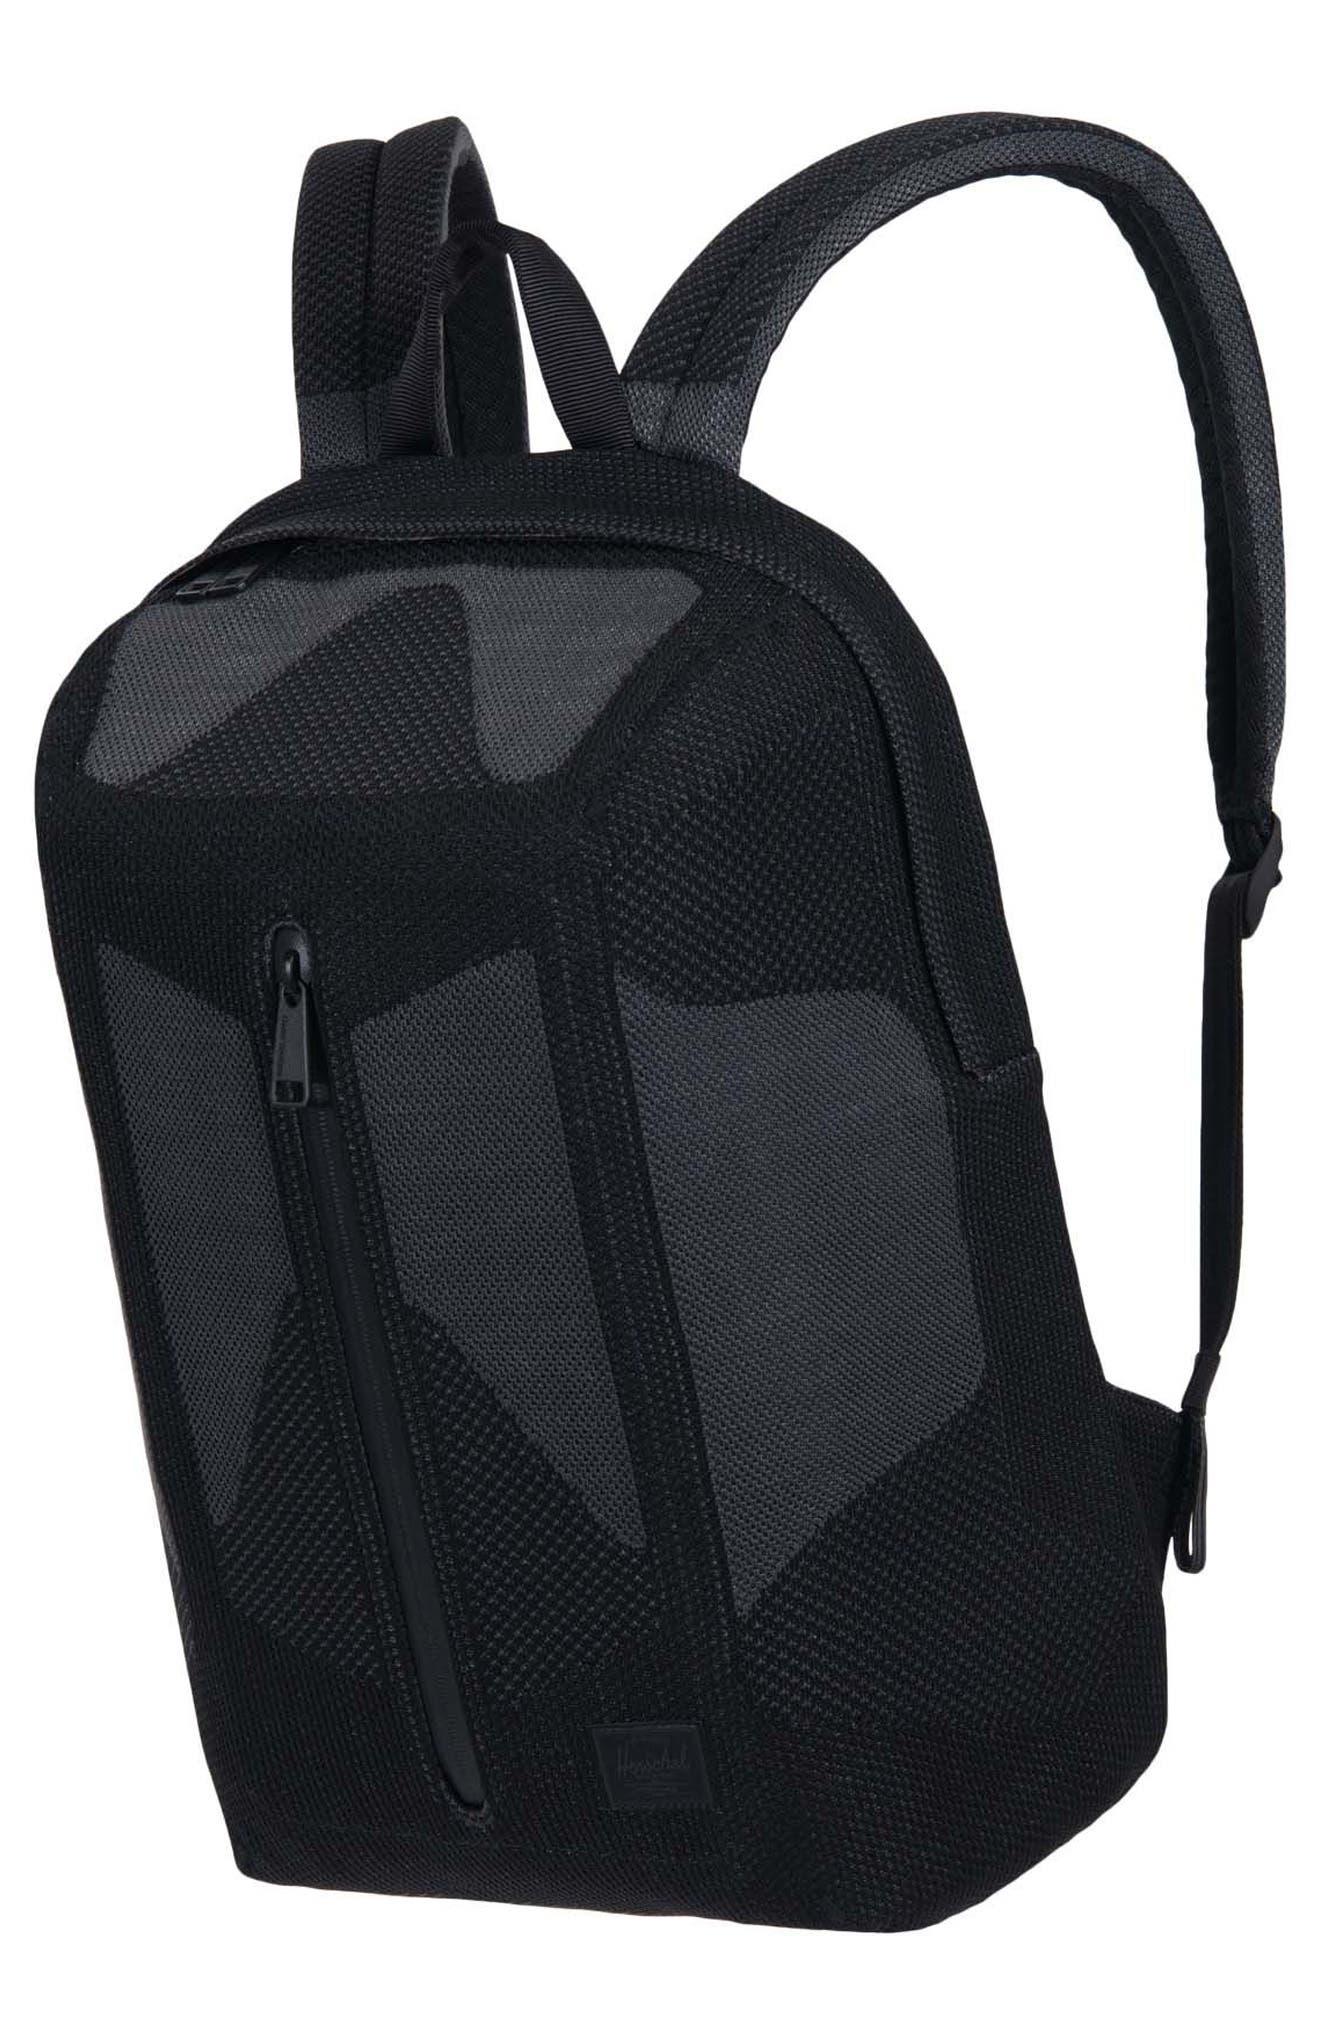 Apex Dayton Backpack,                             Main thumbnail 1, color,                             Black Beauty/ Dark Shadow